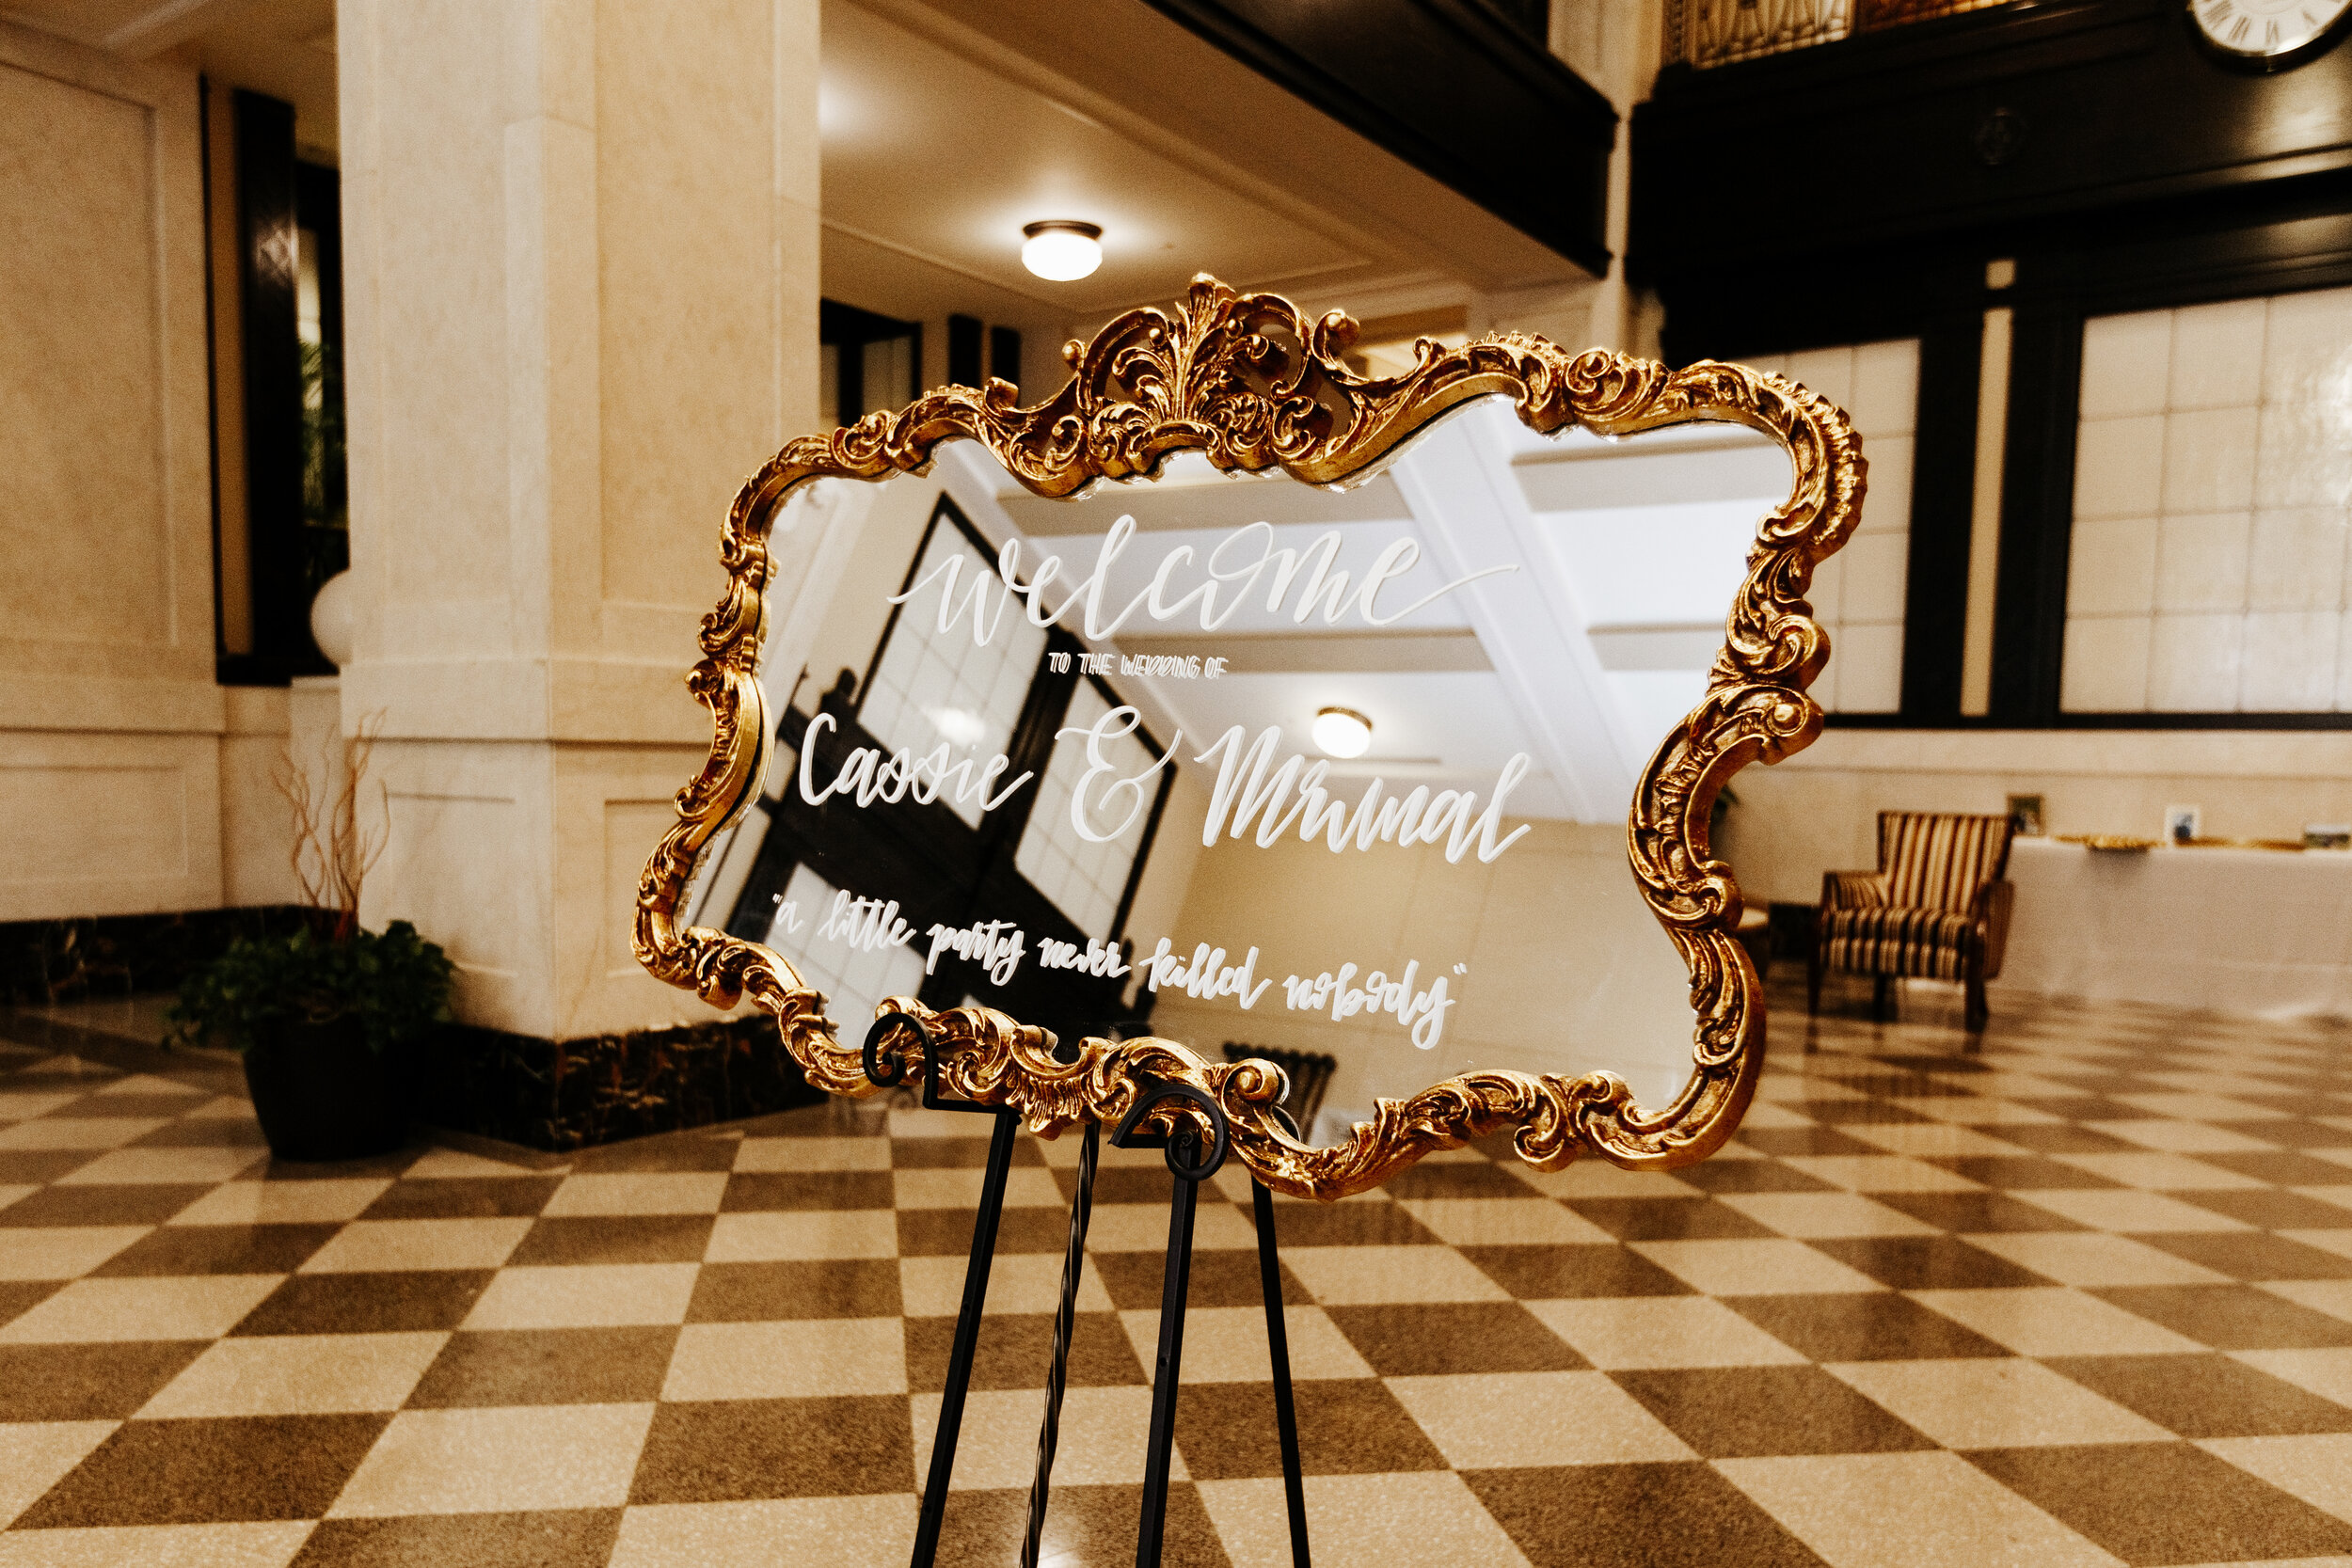 Cassie-Mrunal-Wedding-Quirk-Hotel-John-Marshall-Ballrooms-Richmond-Virginia-Photography-by-V-52.jpg